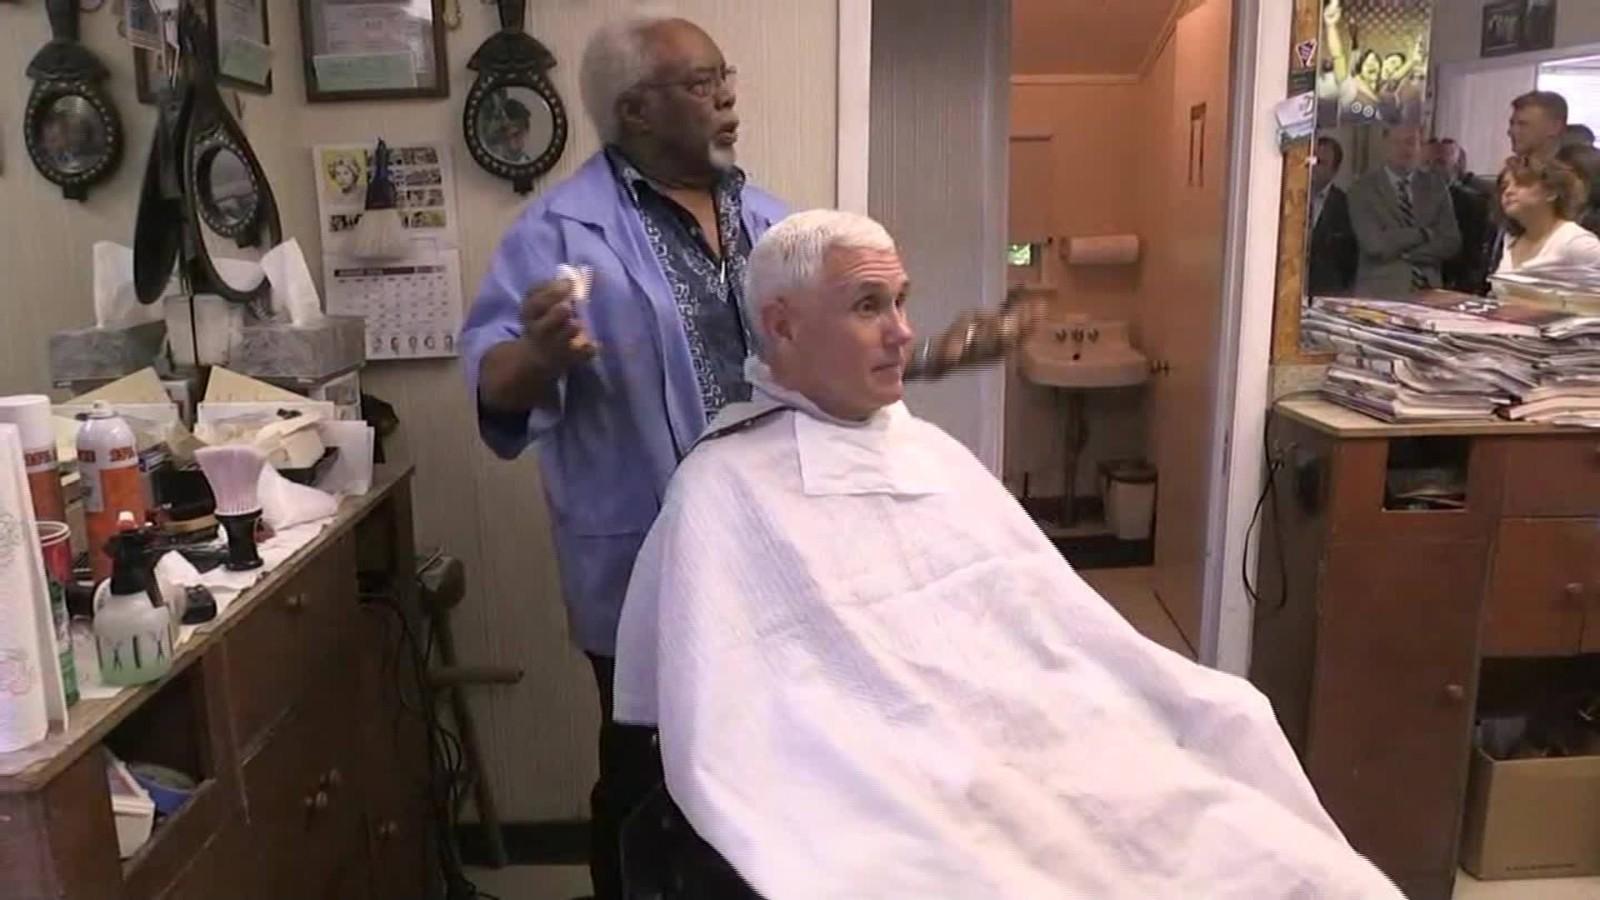 Gov Mike Pence Gets A Haircut Cnn Video